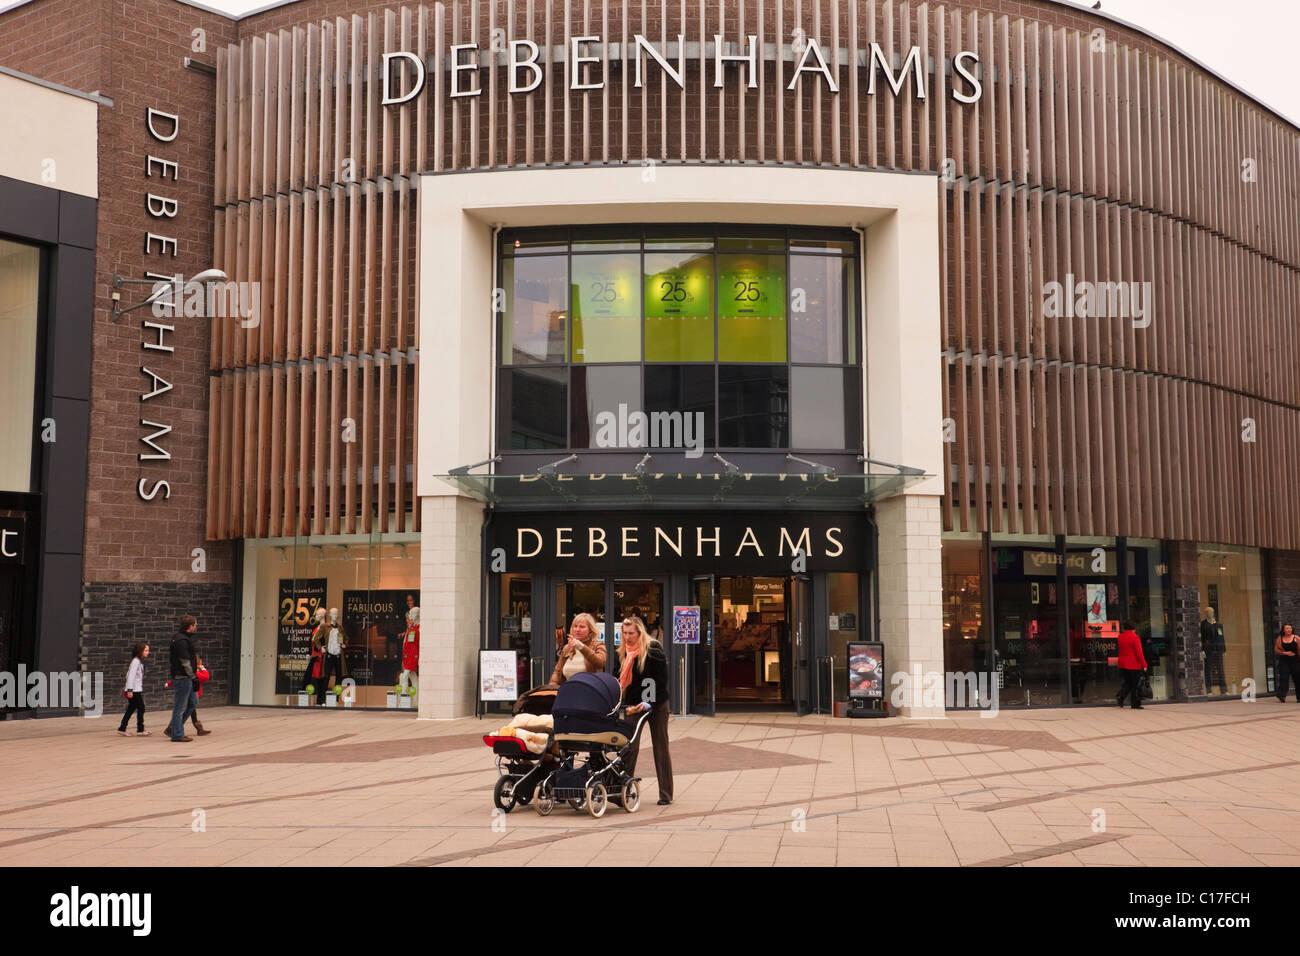 Wrexham, Flintshire, North Wales, UK, Britain. Debenhams department store at Eagles Meadow shopping centre - Stock Image